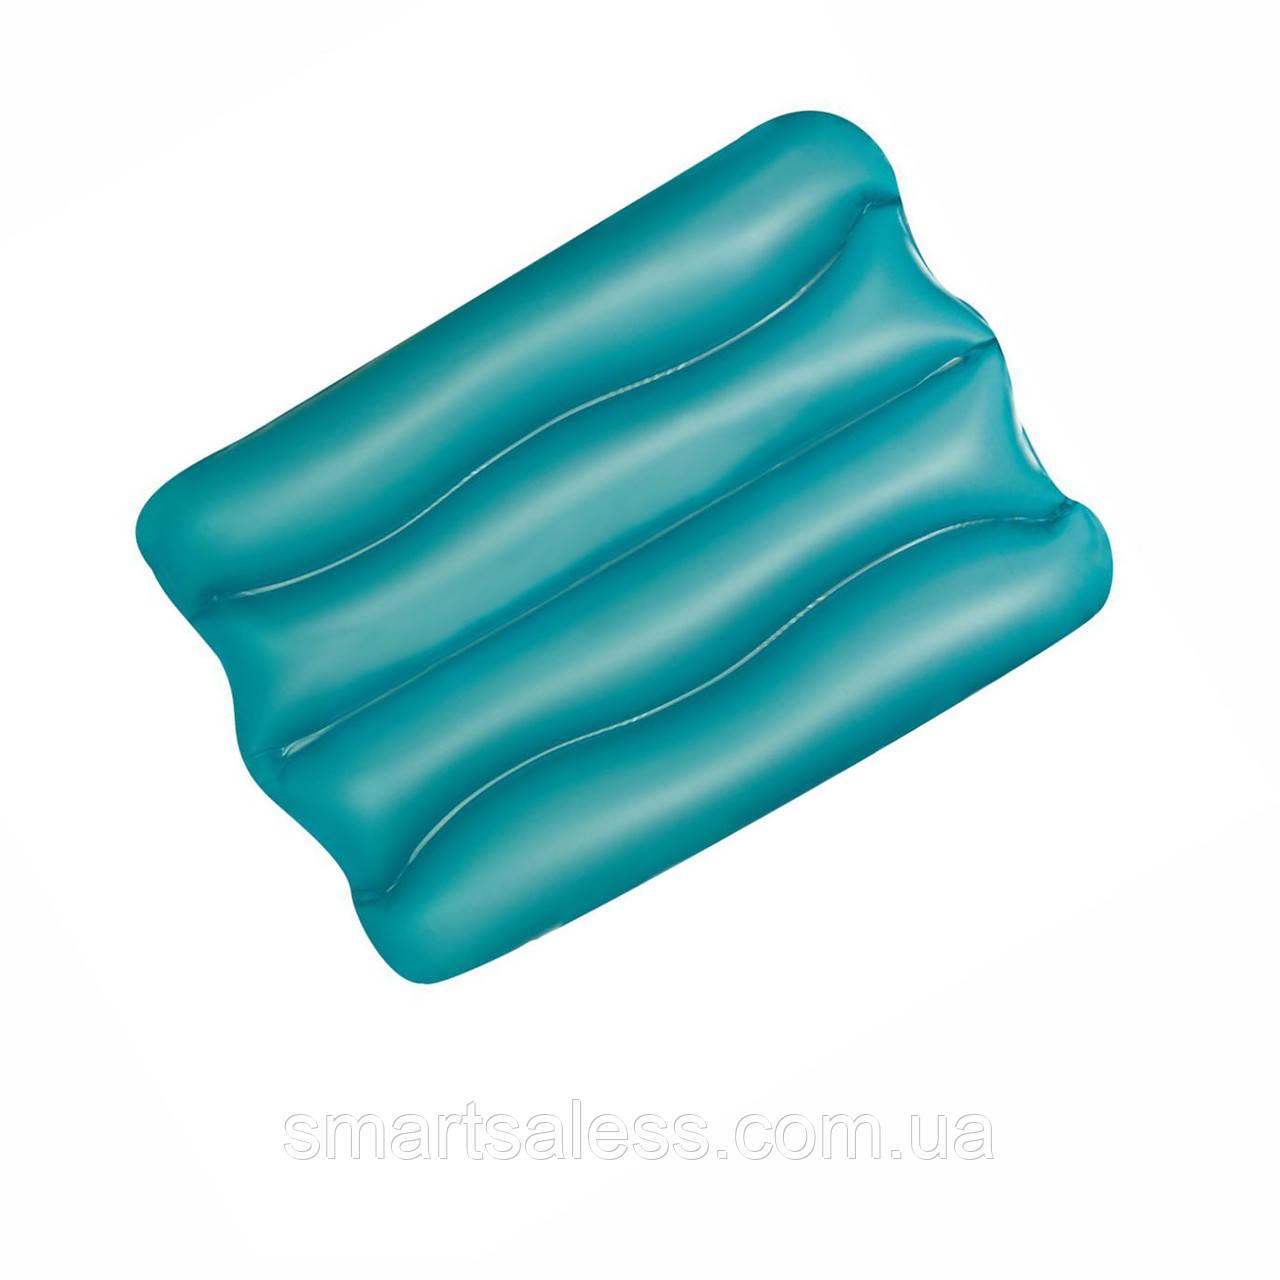 Надувная виниловая подушка Bestway 52127, голубая, 38 х 25 х 5 см